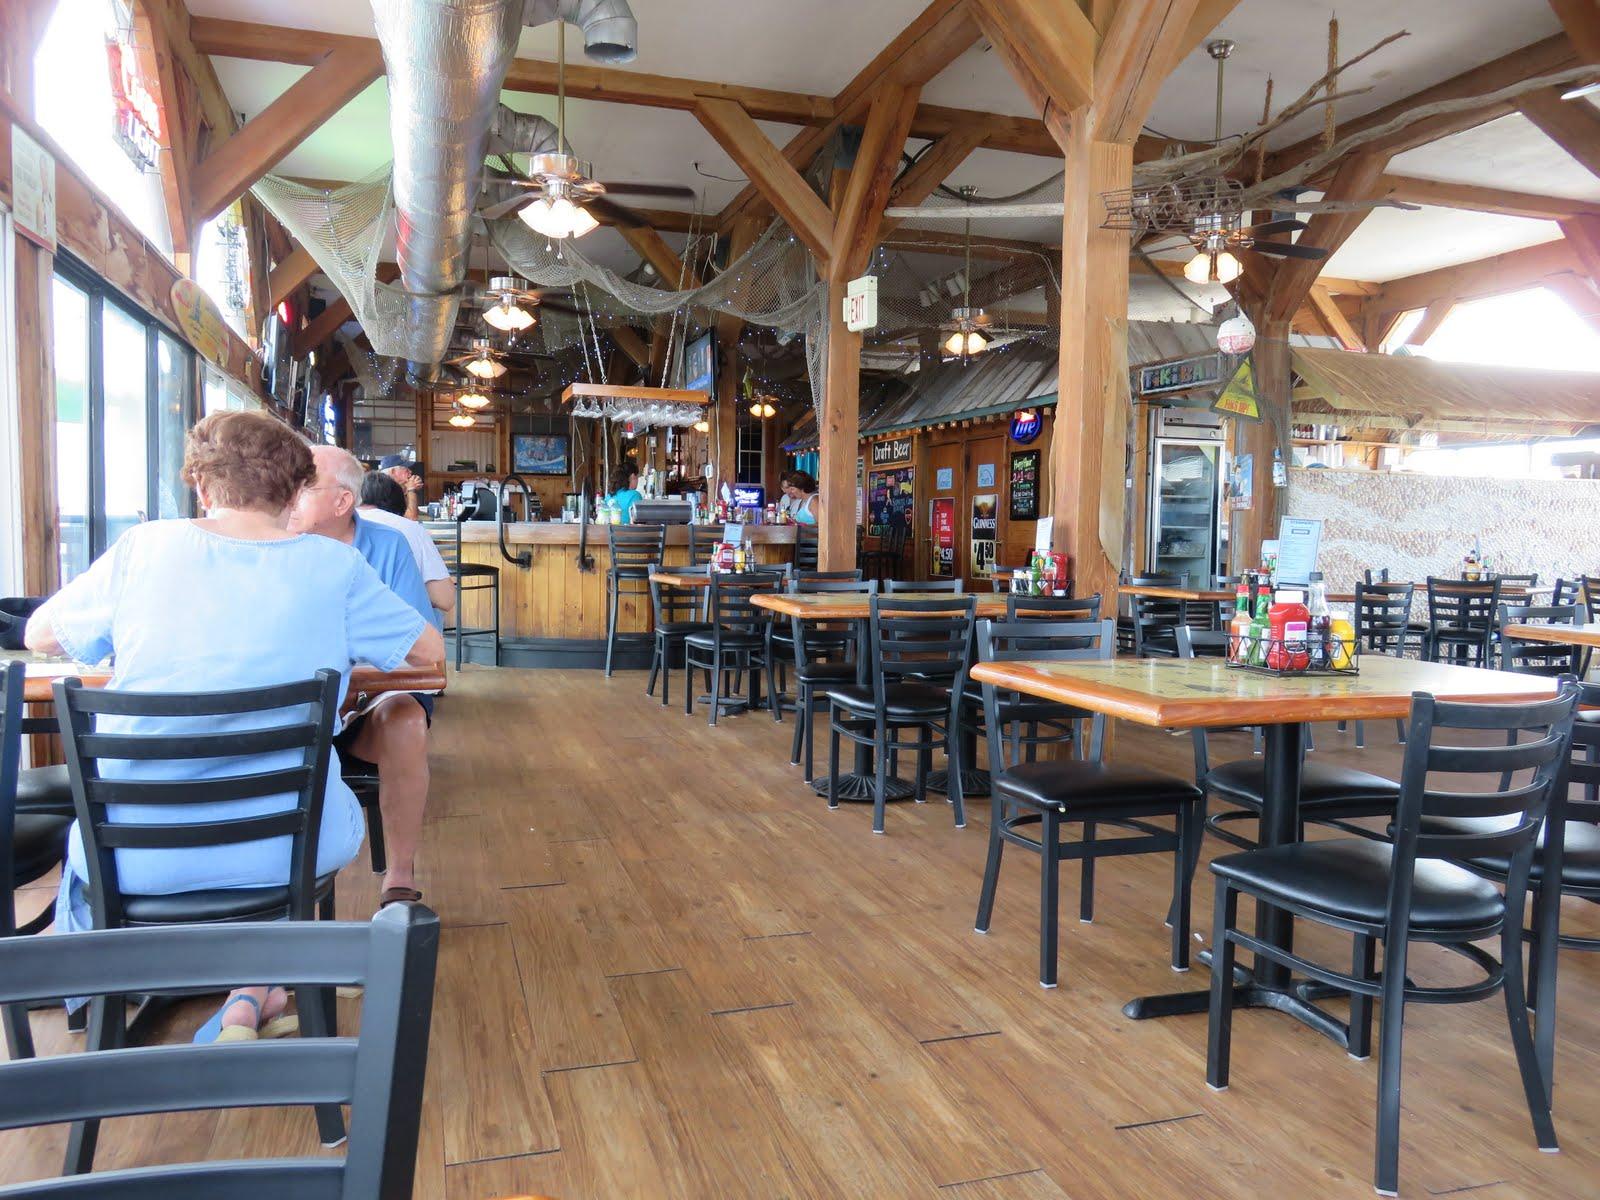 Big daddy dave steamers clam bar and grill cedar key florida - Restaurant bar and grill ...